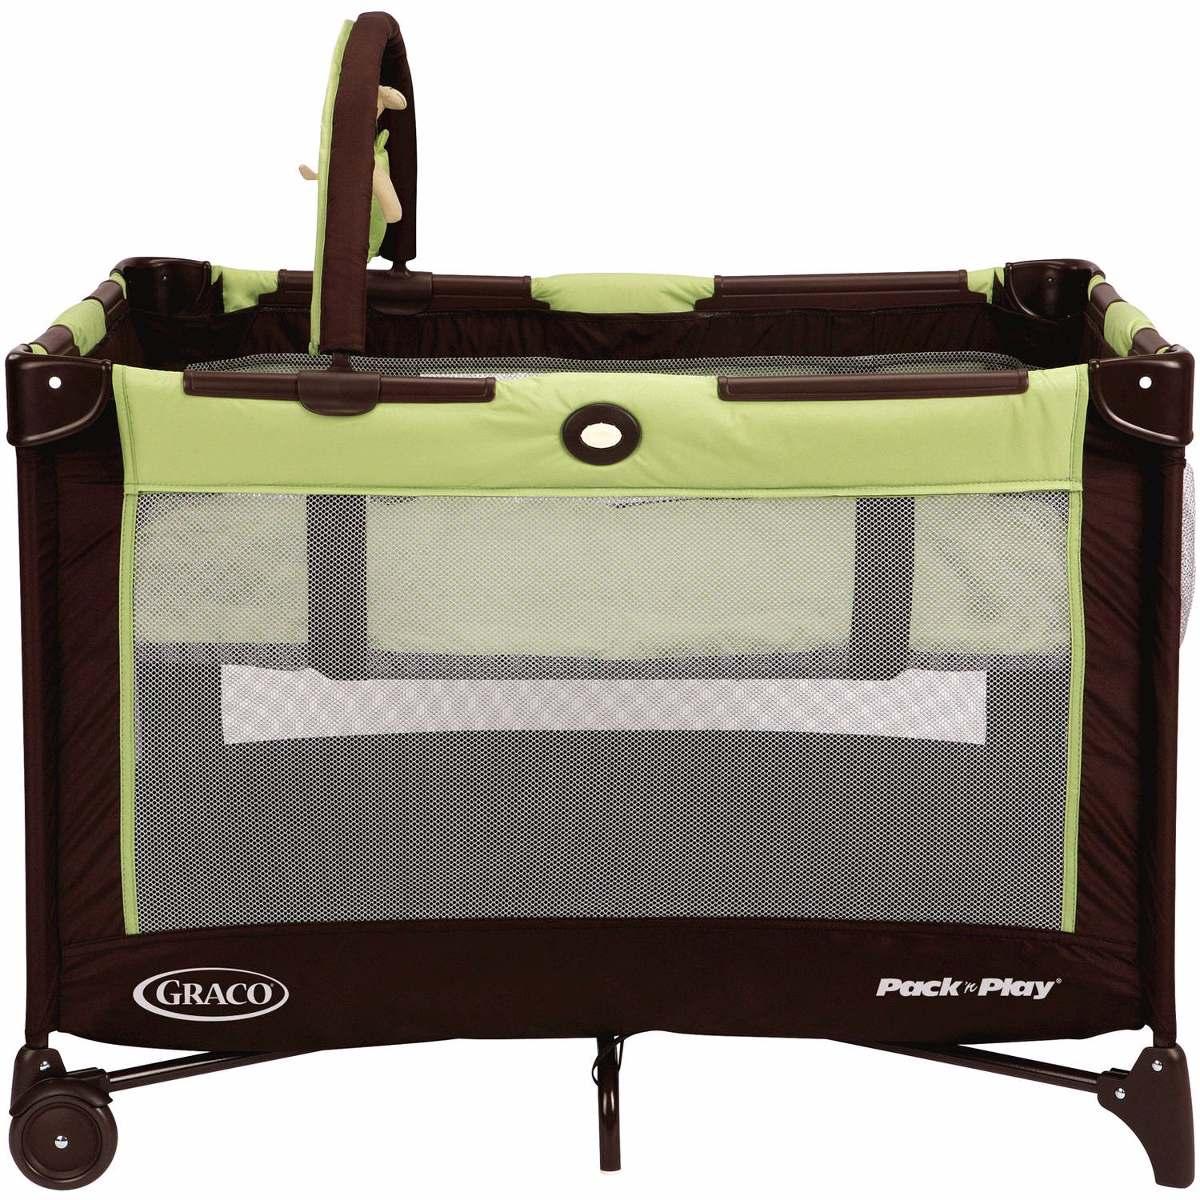 corral moises para bebe cuna portatil y cambiador cafe verde 2 en mercado libre. Black Bedroom Furniture Sets. Home Design Ideas